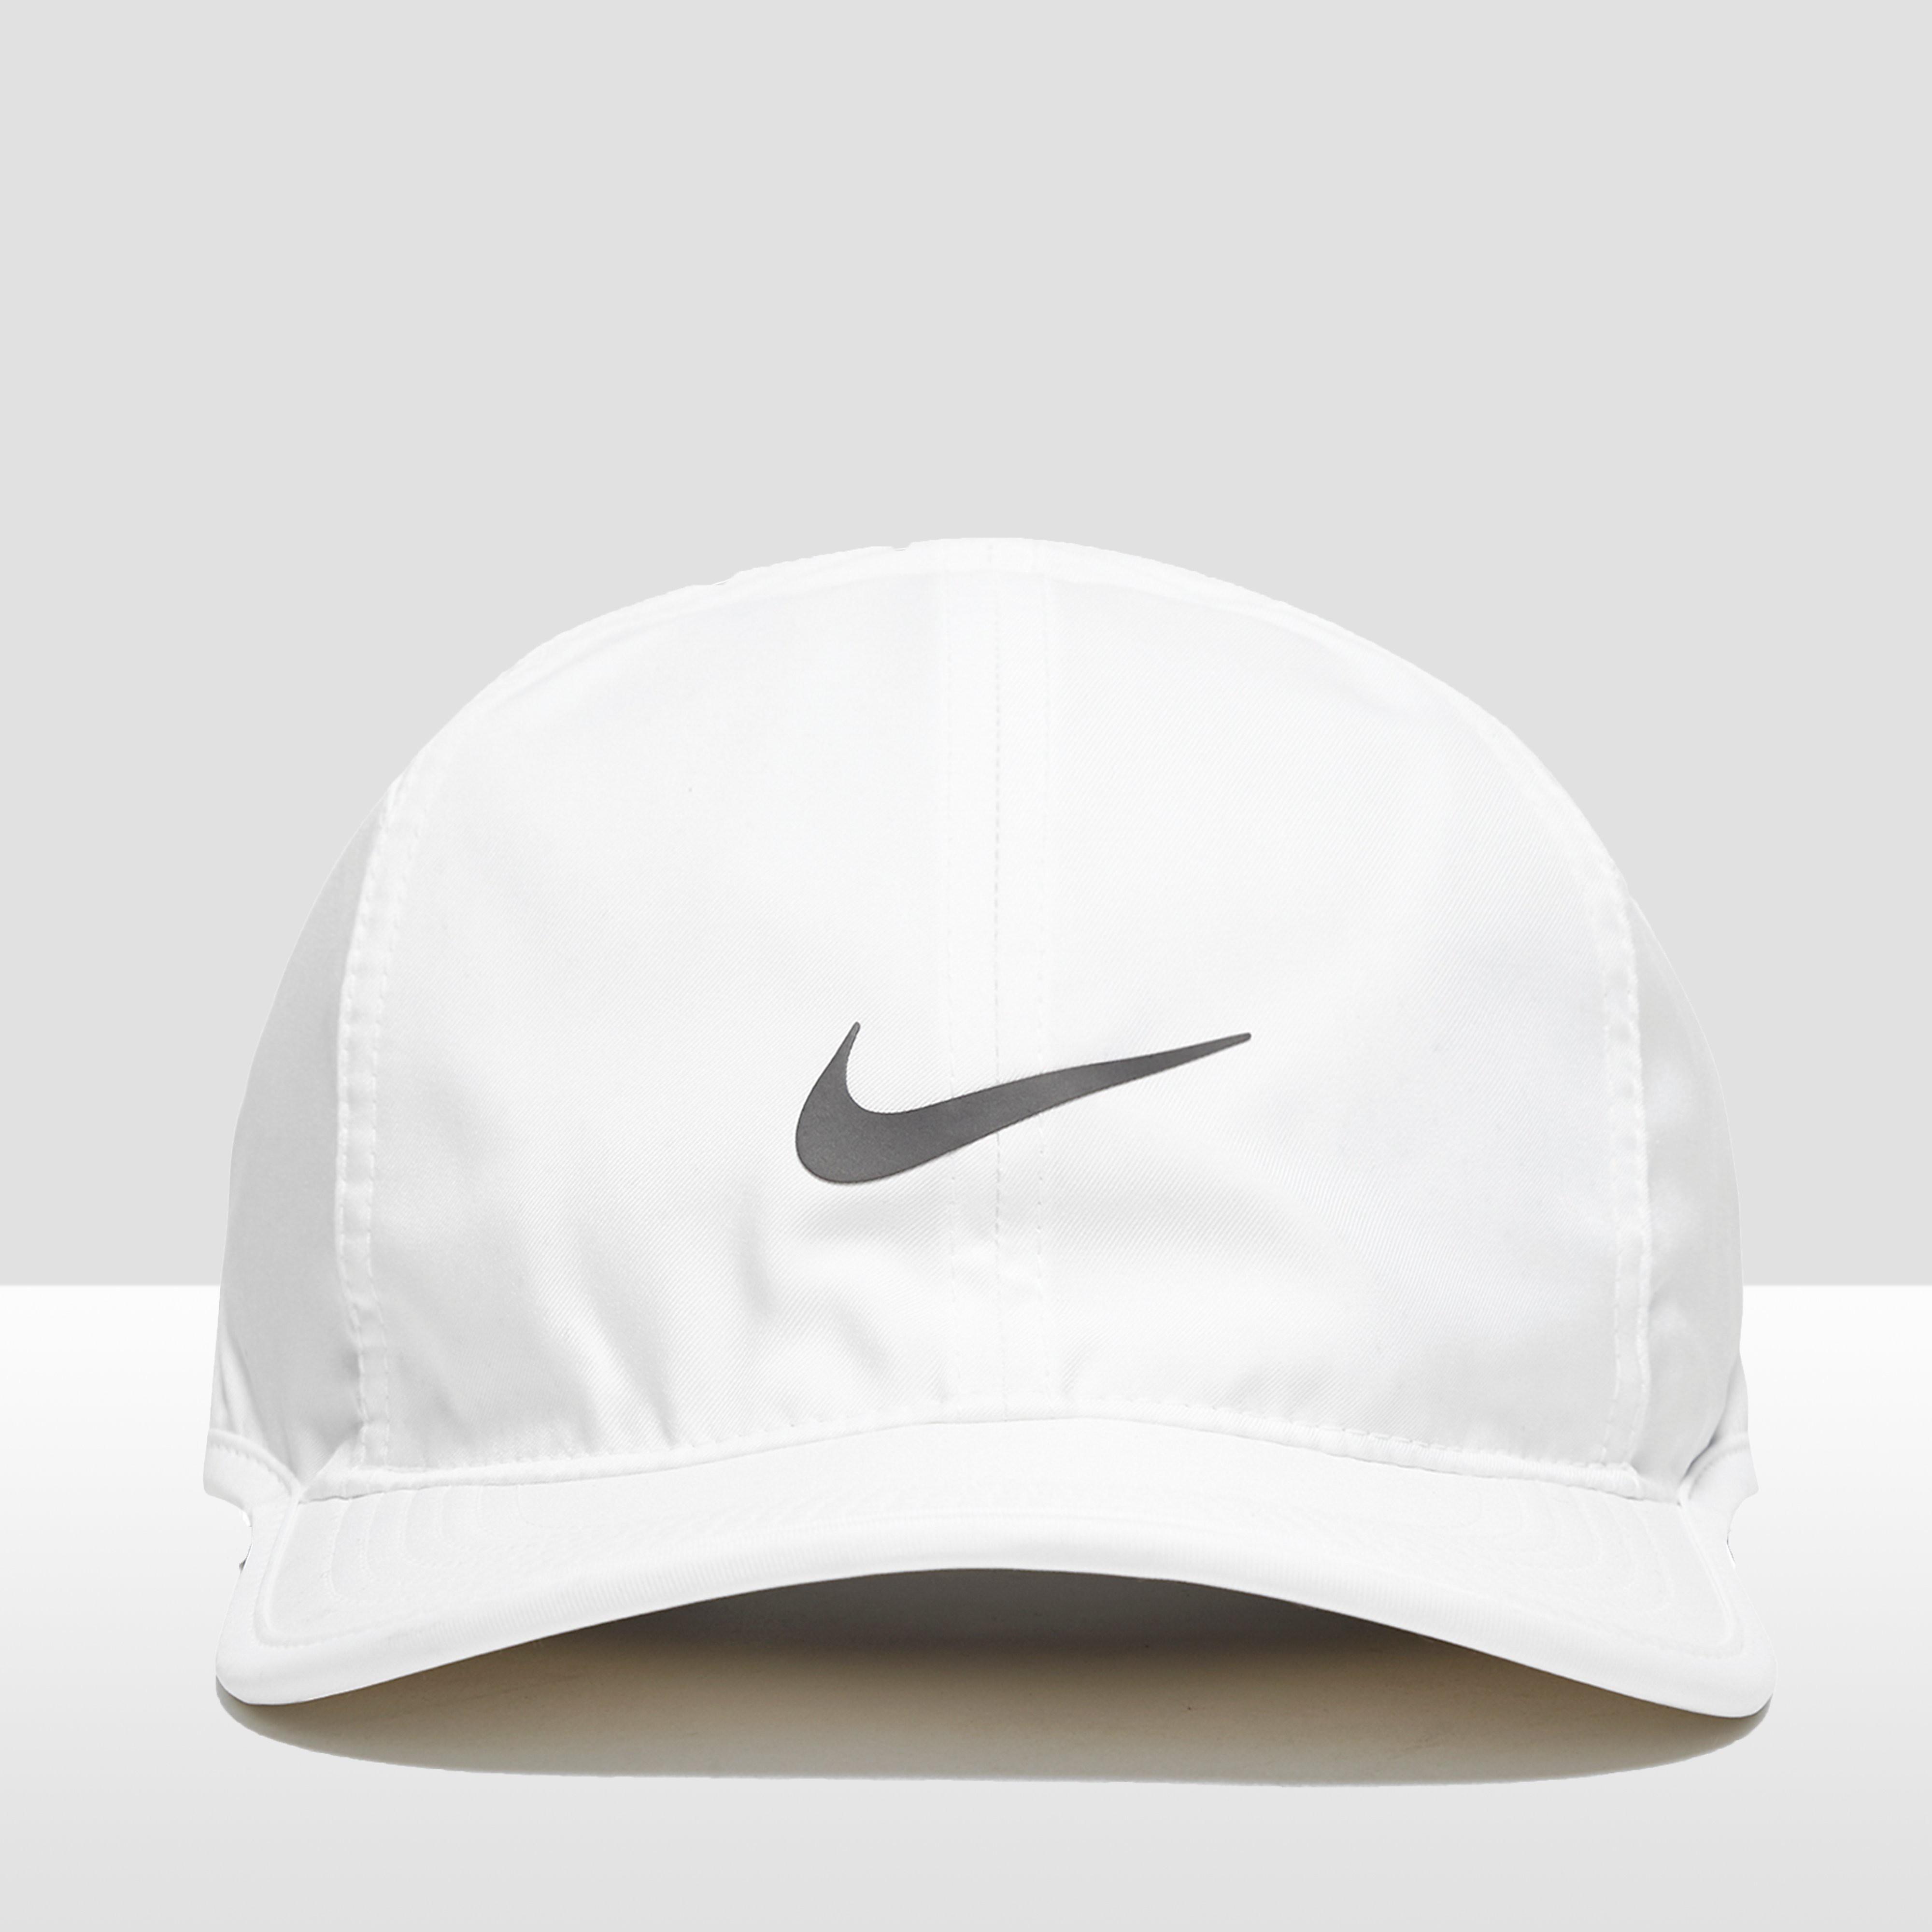 Nike Featherlight Adjustable Tennis Hat